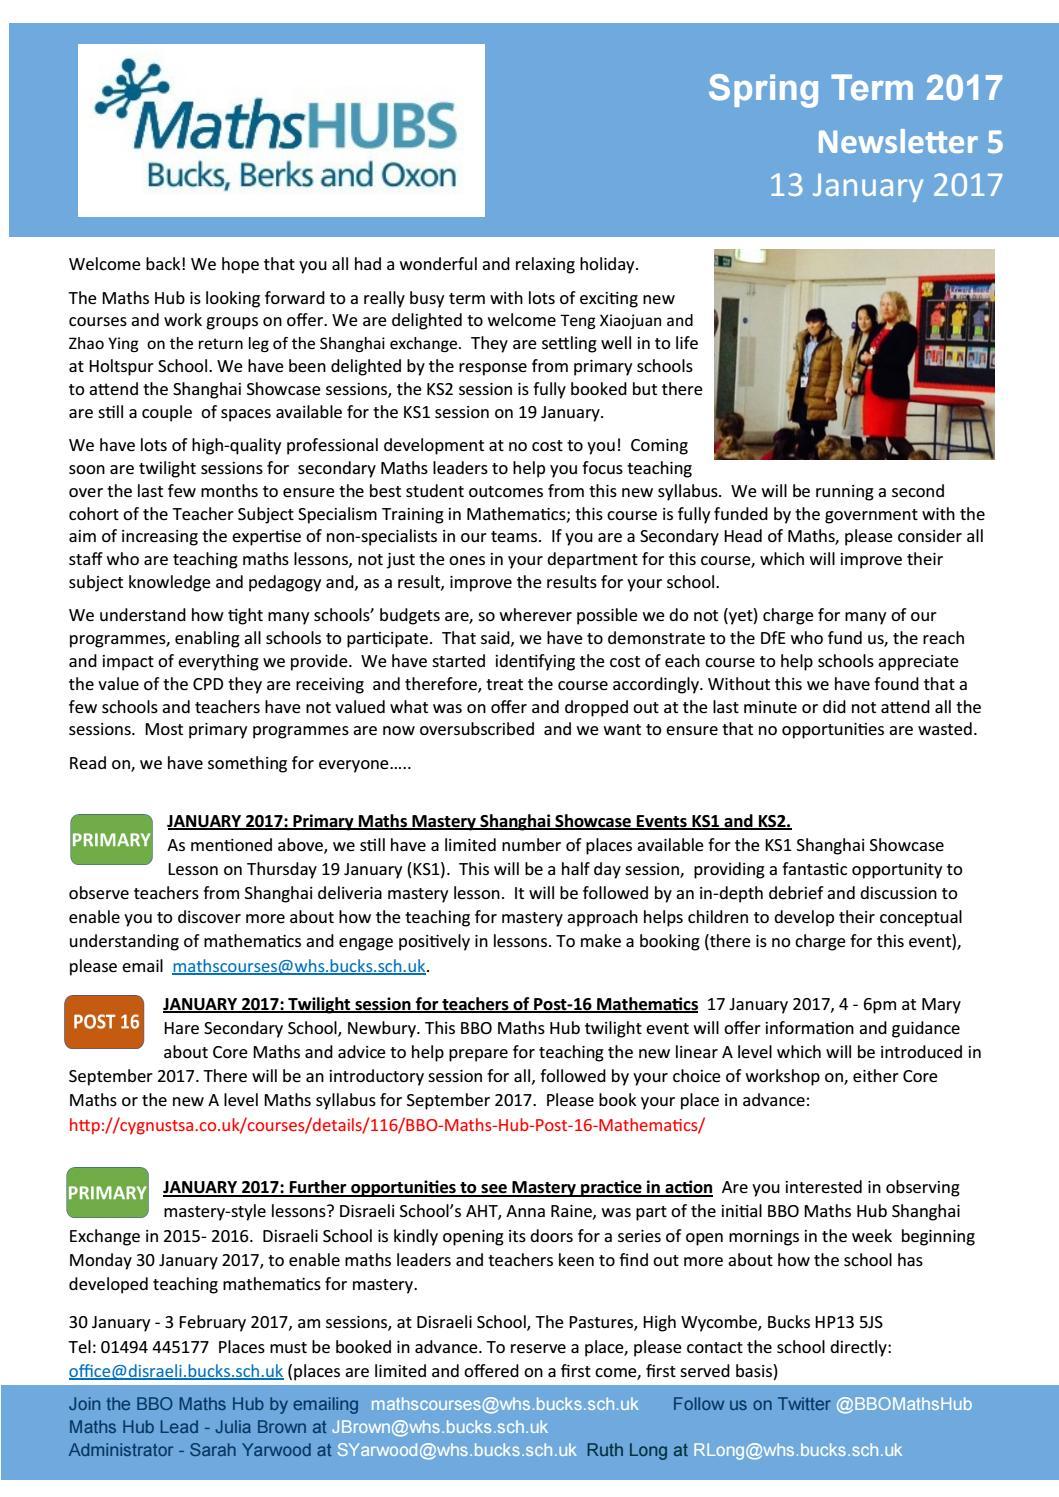 BBO Maths Hub Newsletter 5 Jan 17 by Wycombe High School - issuu